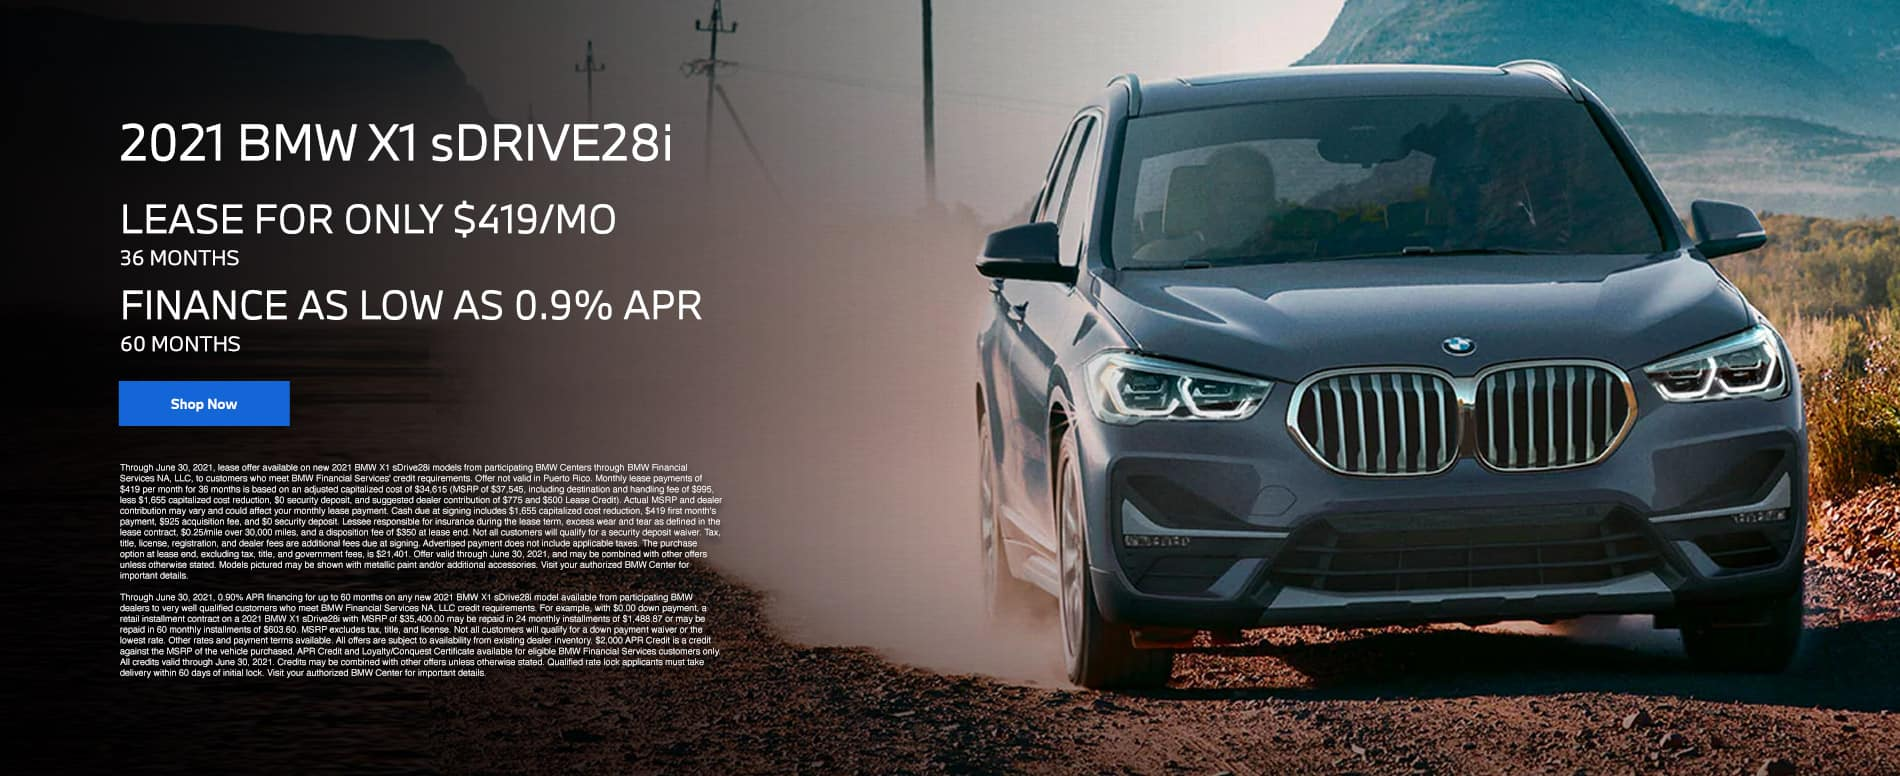 BMW X1 Offer